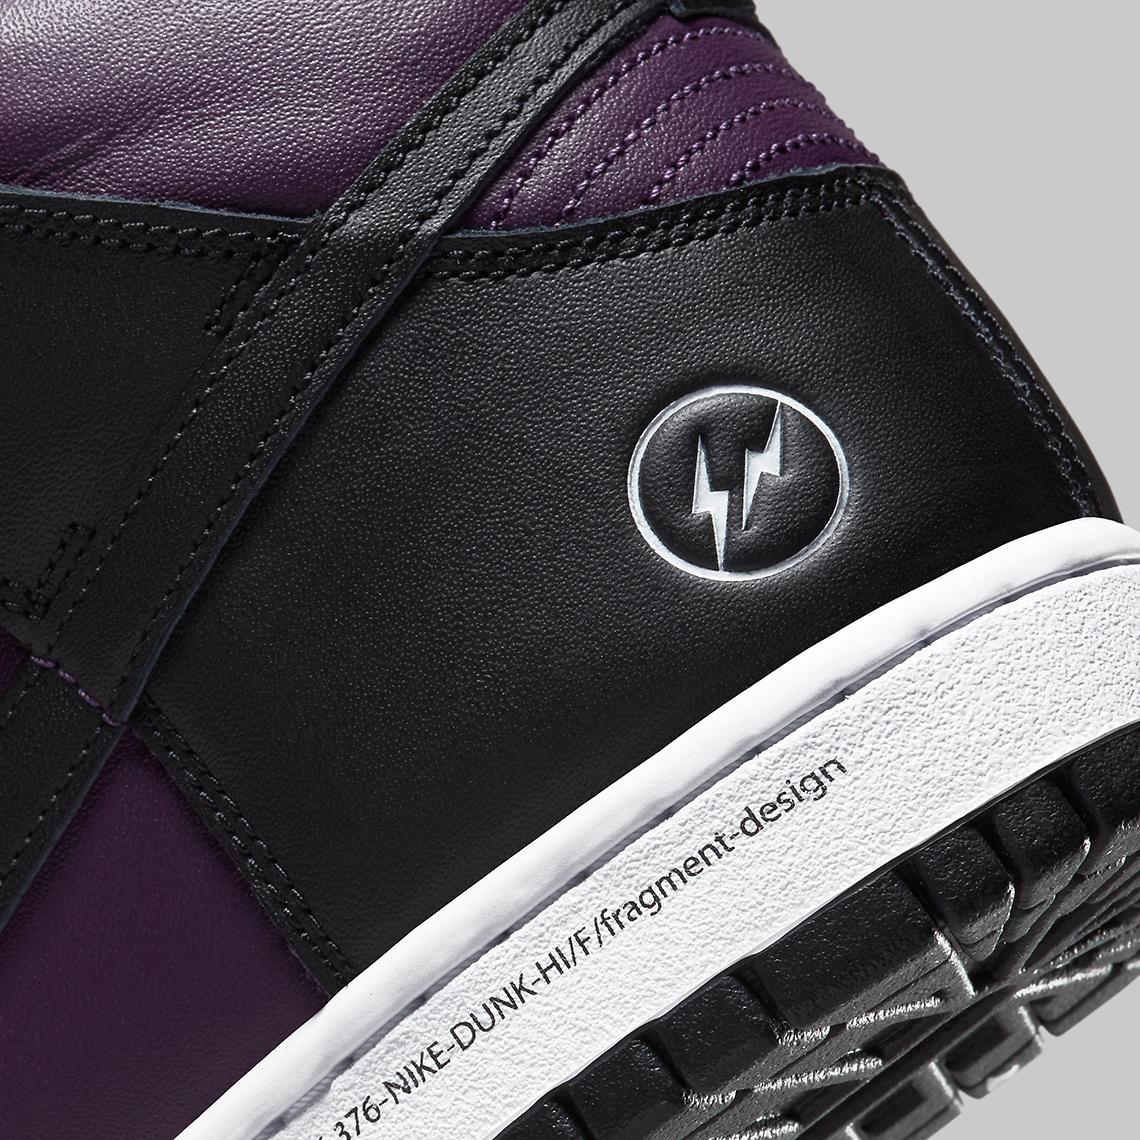 fragment-Nike-Dunk-High-Beijing-2021-DJ0382-600-7.jpg?w=1140